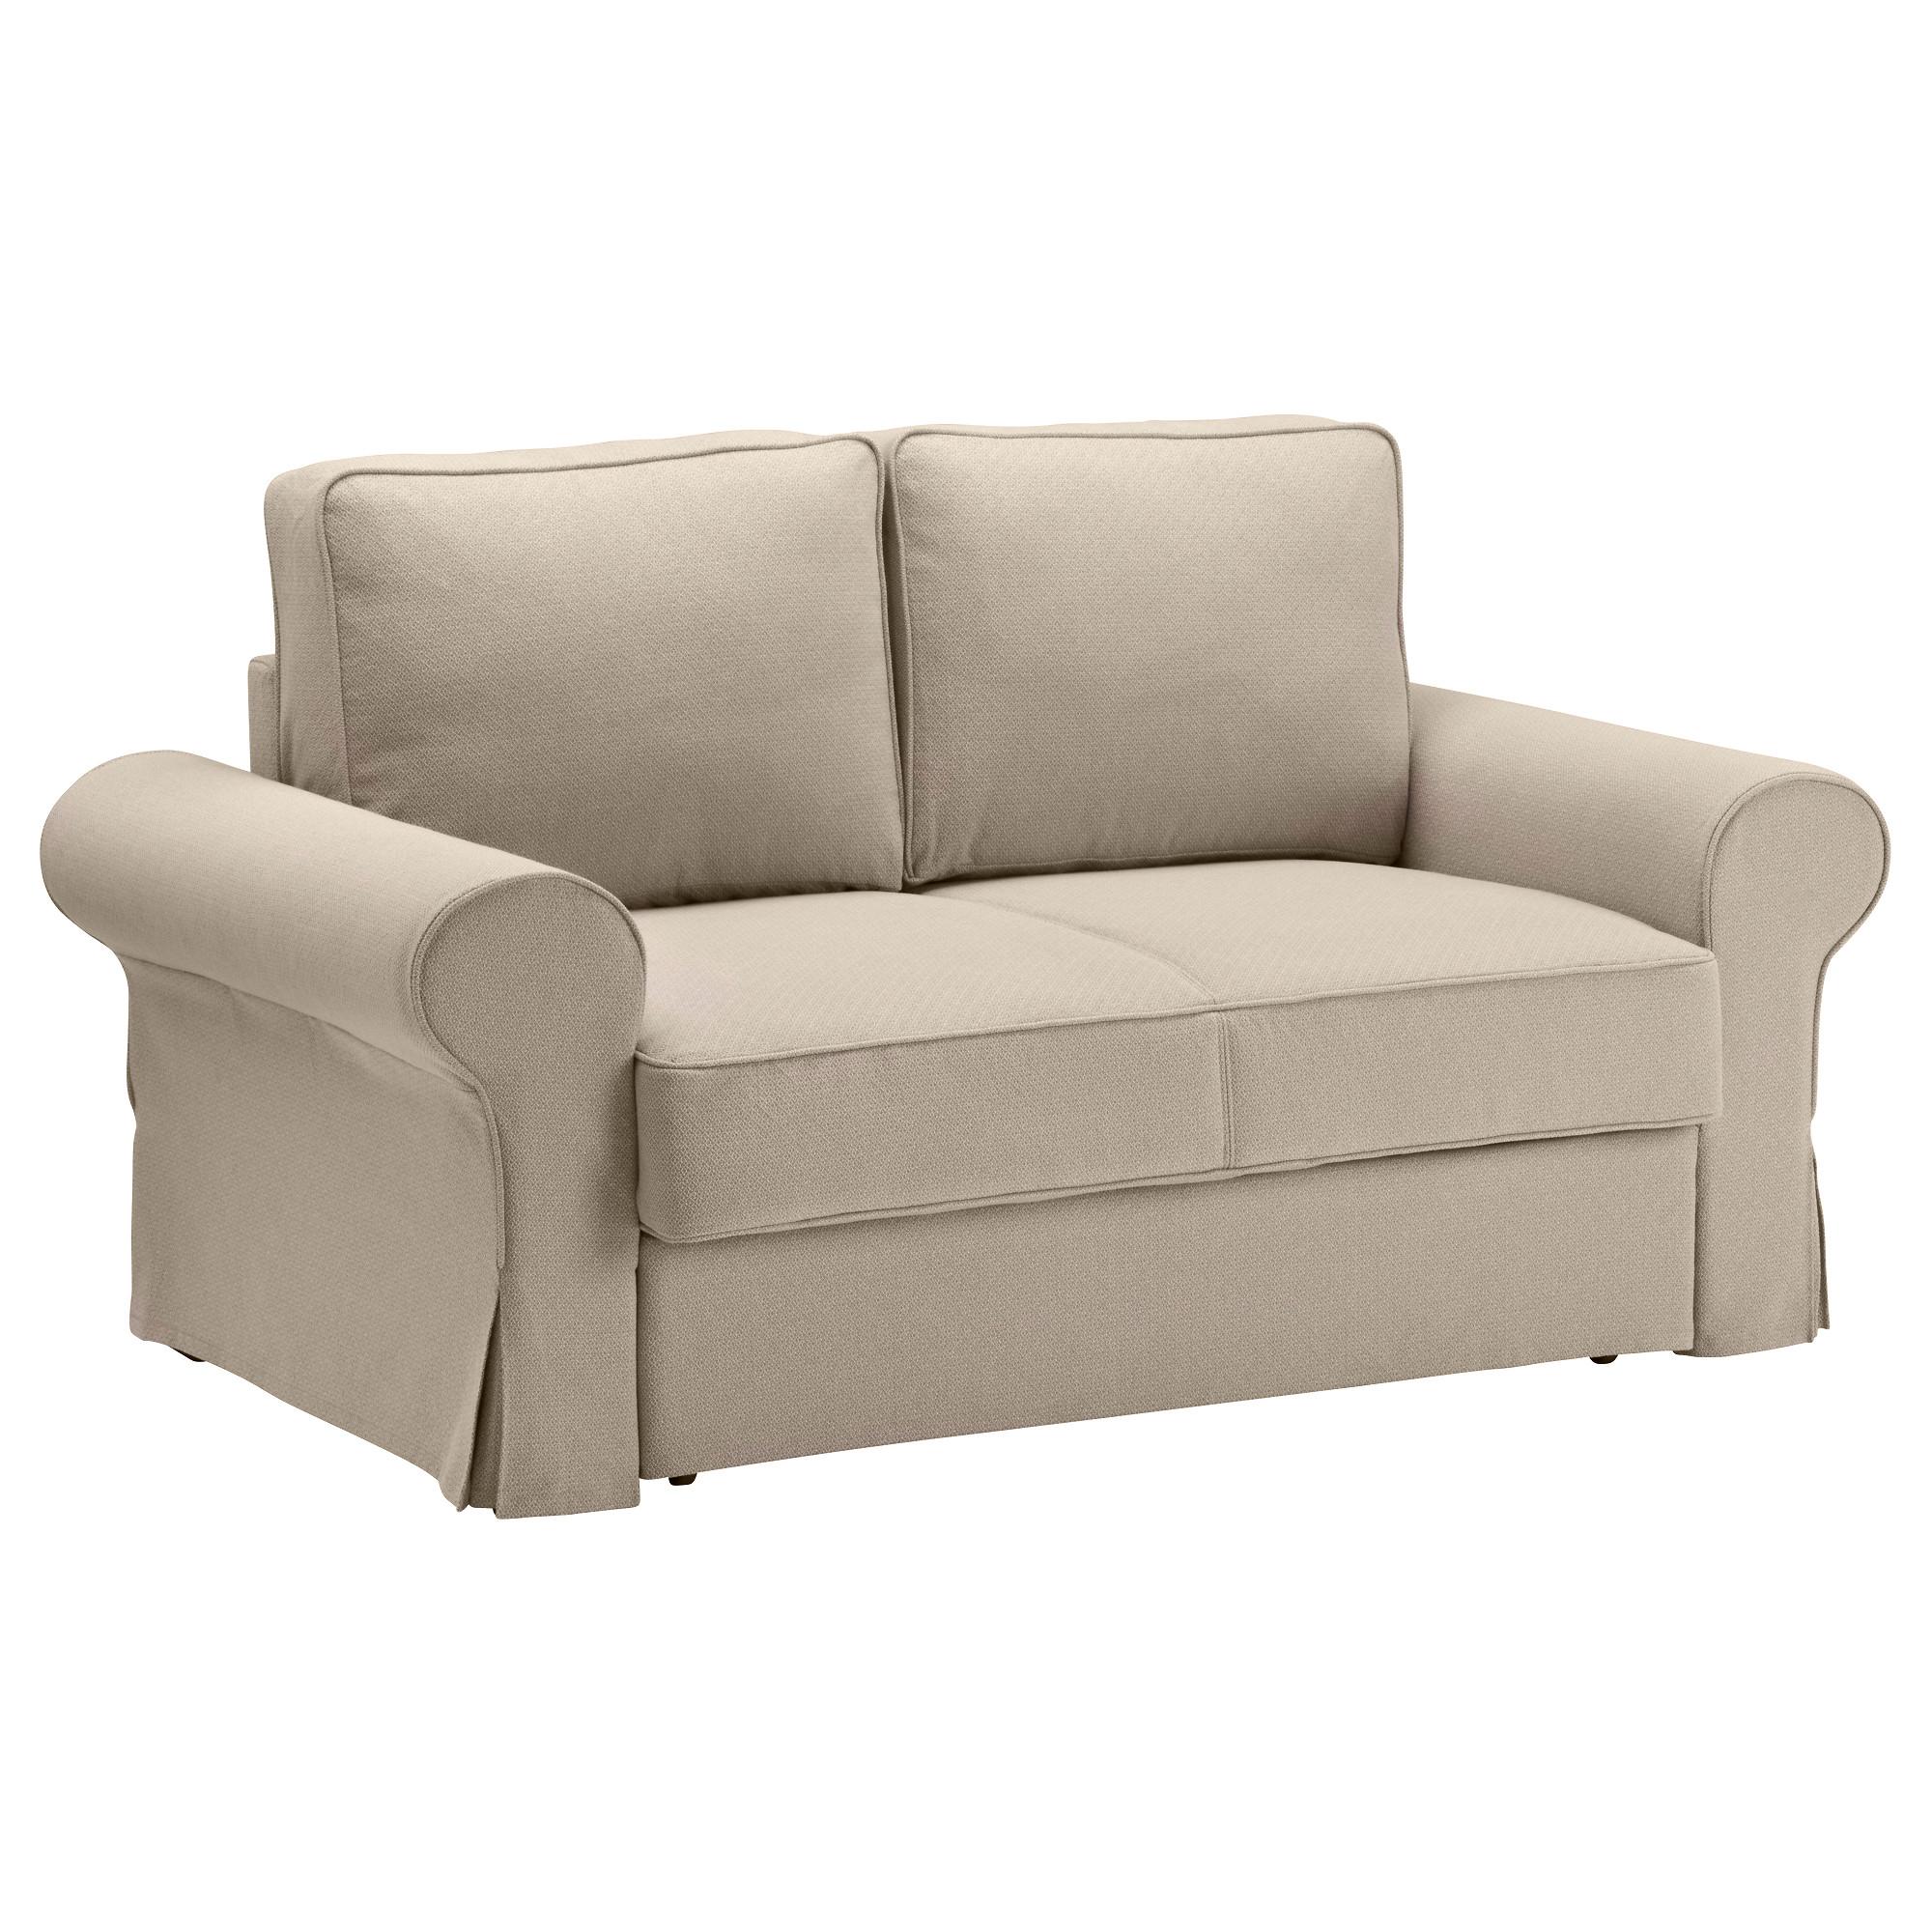 Sillon Cama 1 Plaza Merkamueble Dddy sofà S Cama De Calidad Pra Online Ikea